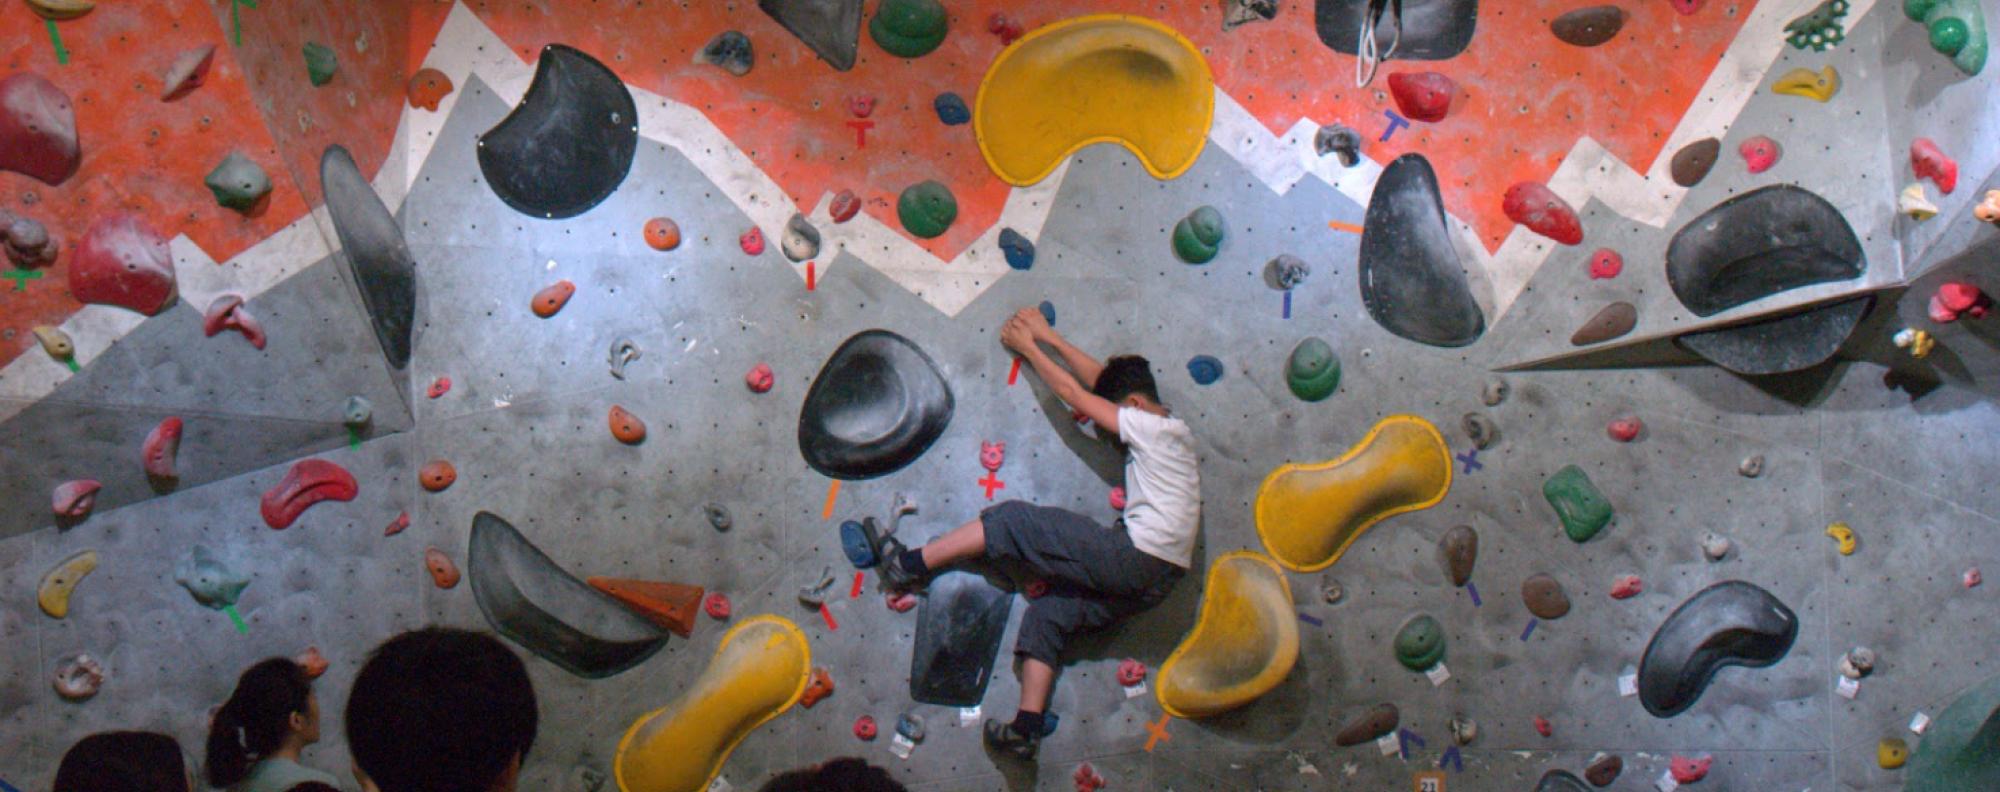 Owen Dong works his way through a bouldering problem. Photos: Mark Agnew